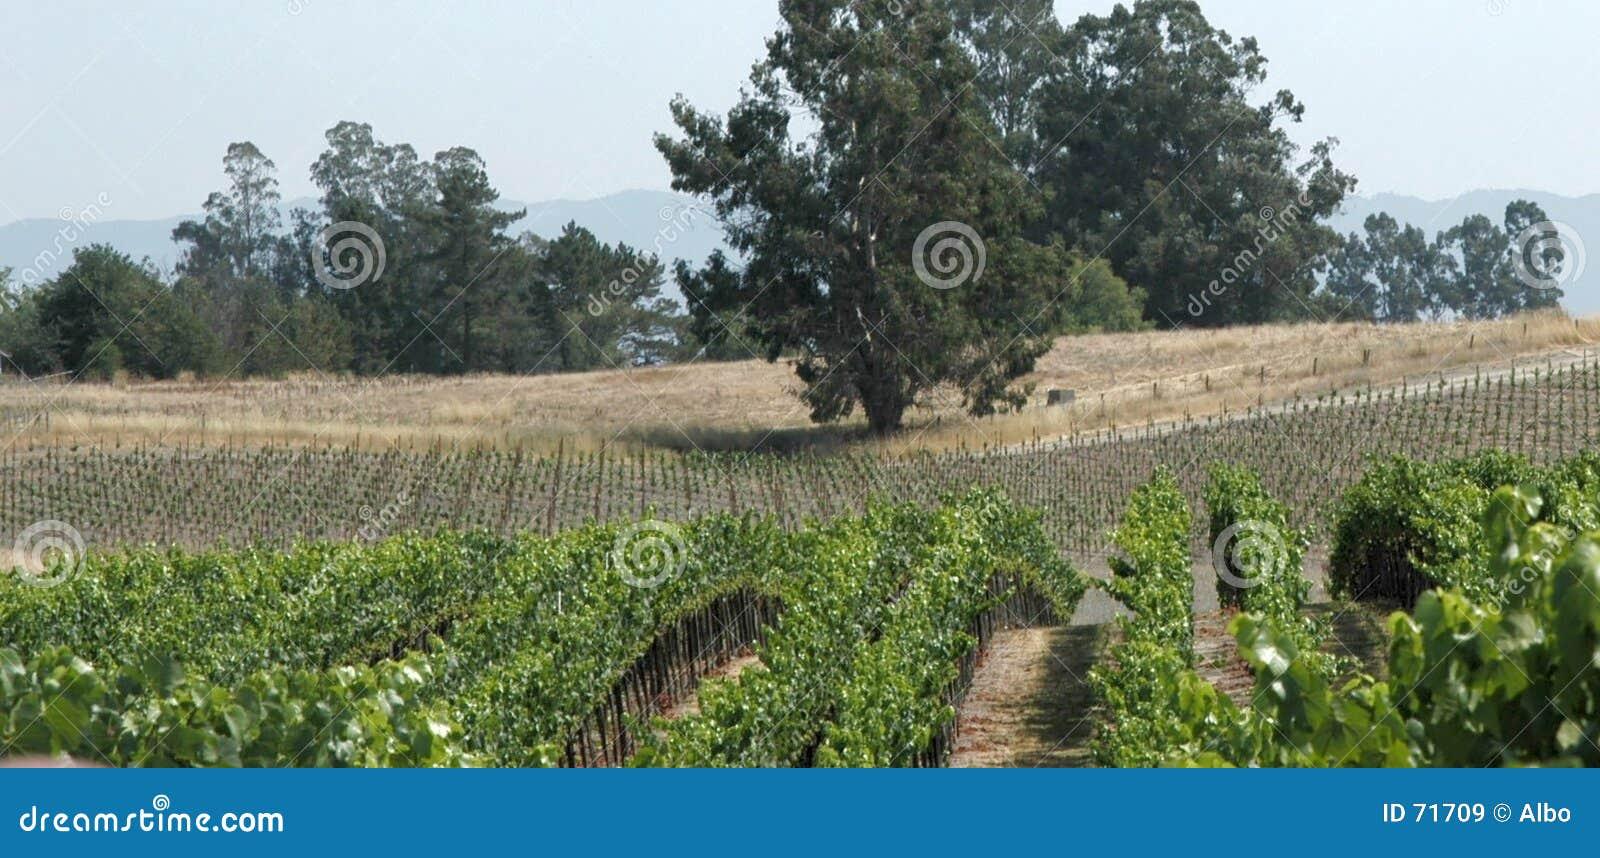 Panorama de los viñedos